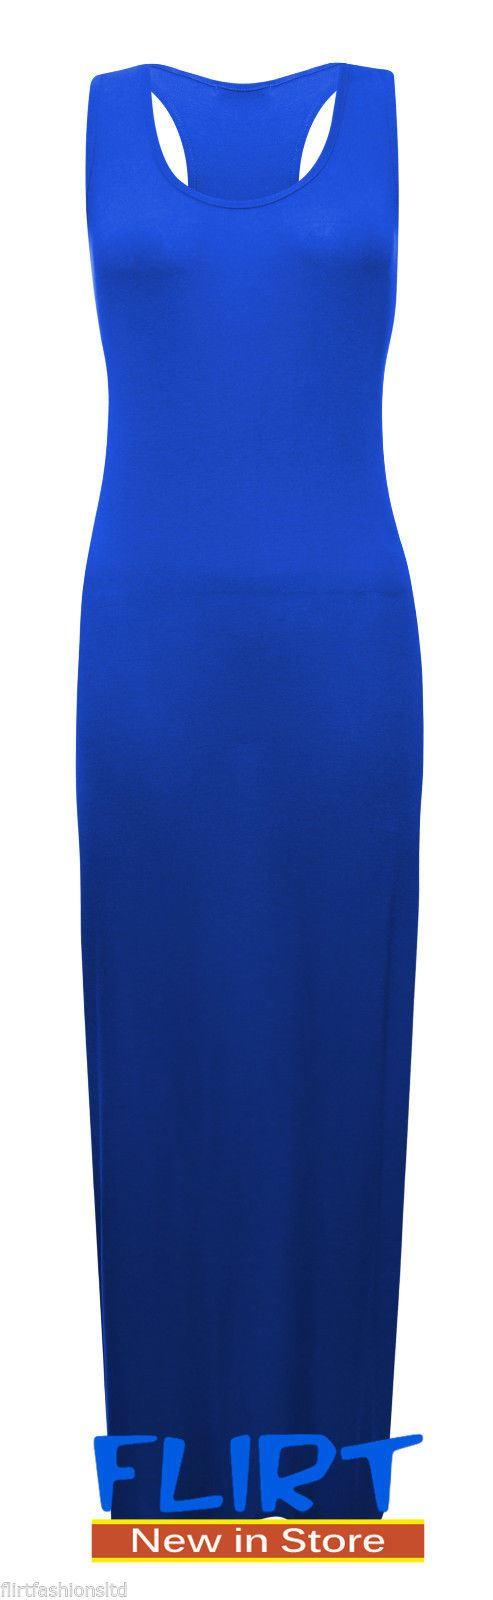 Plus Size Womens Racer Back Plain Maxi Dress Bodycon Sleeveless Ladies Sexy Long